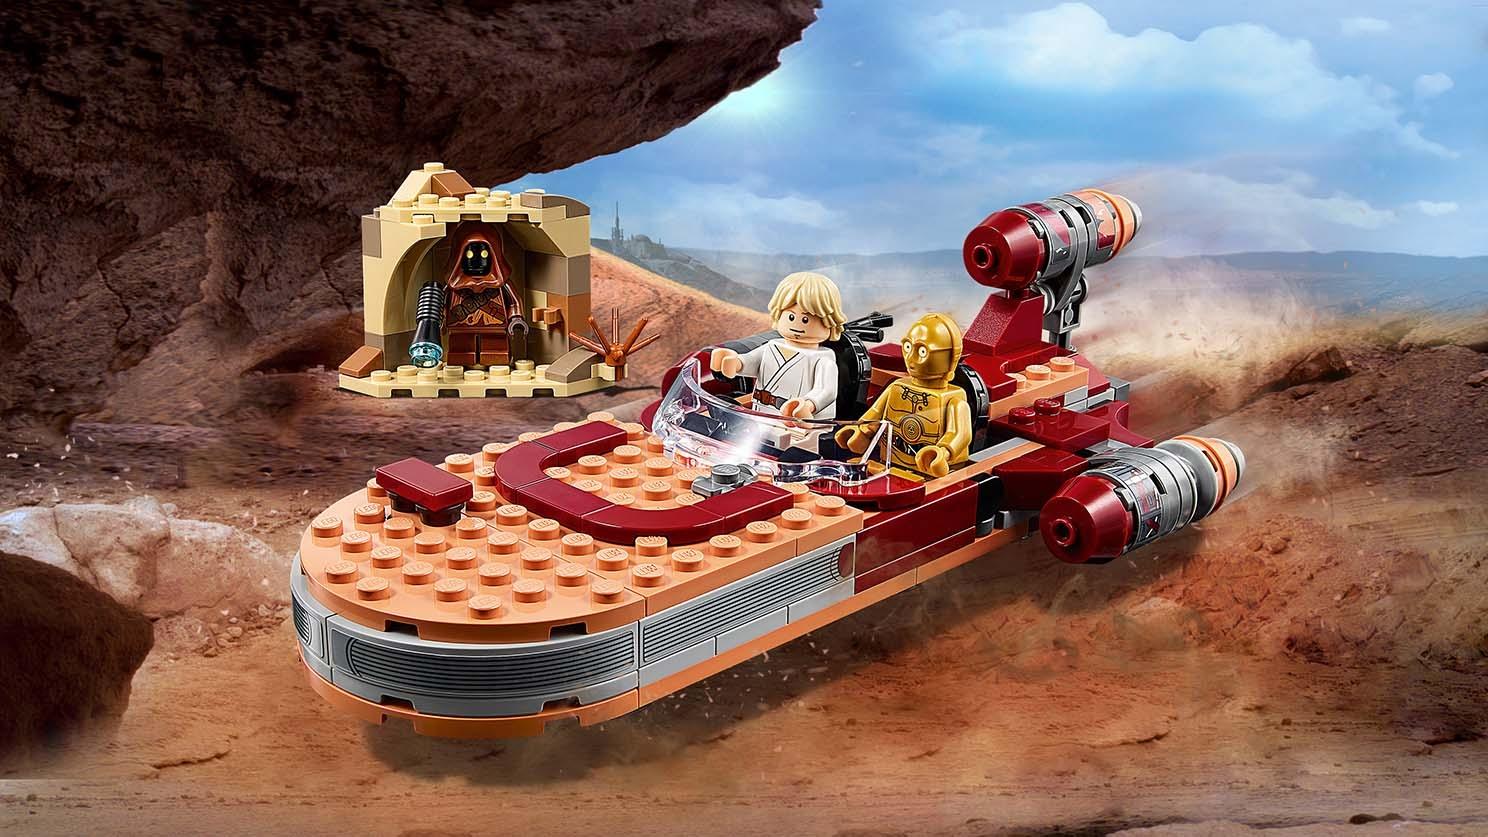 LEGO Star Wars, Le landspeeder de Luke Skywalker avec figurine de Jawa, Série Un nouvel espoir